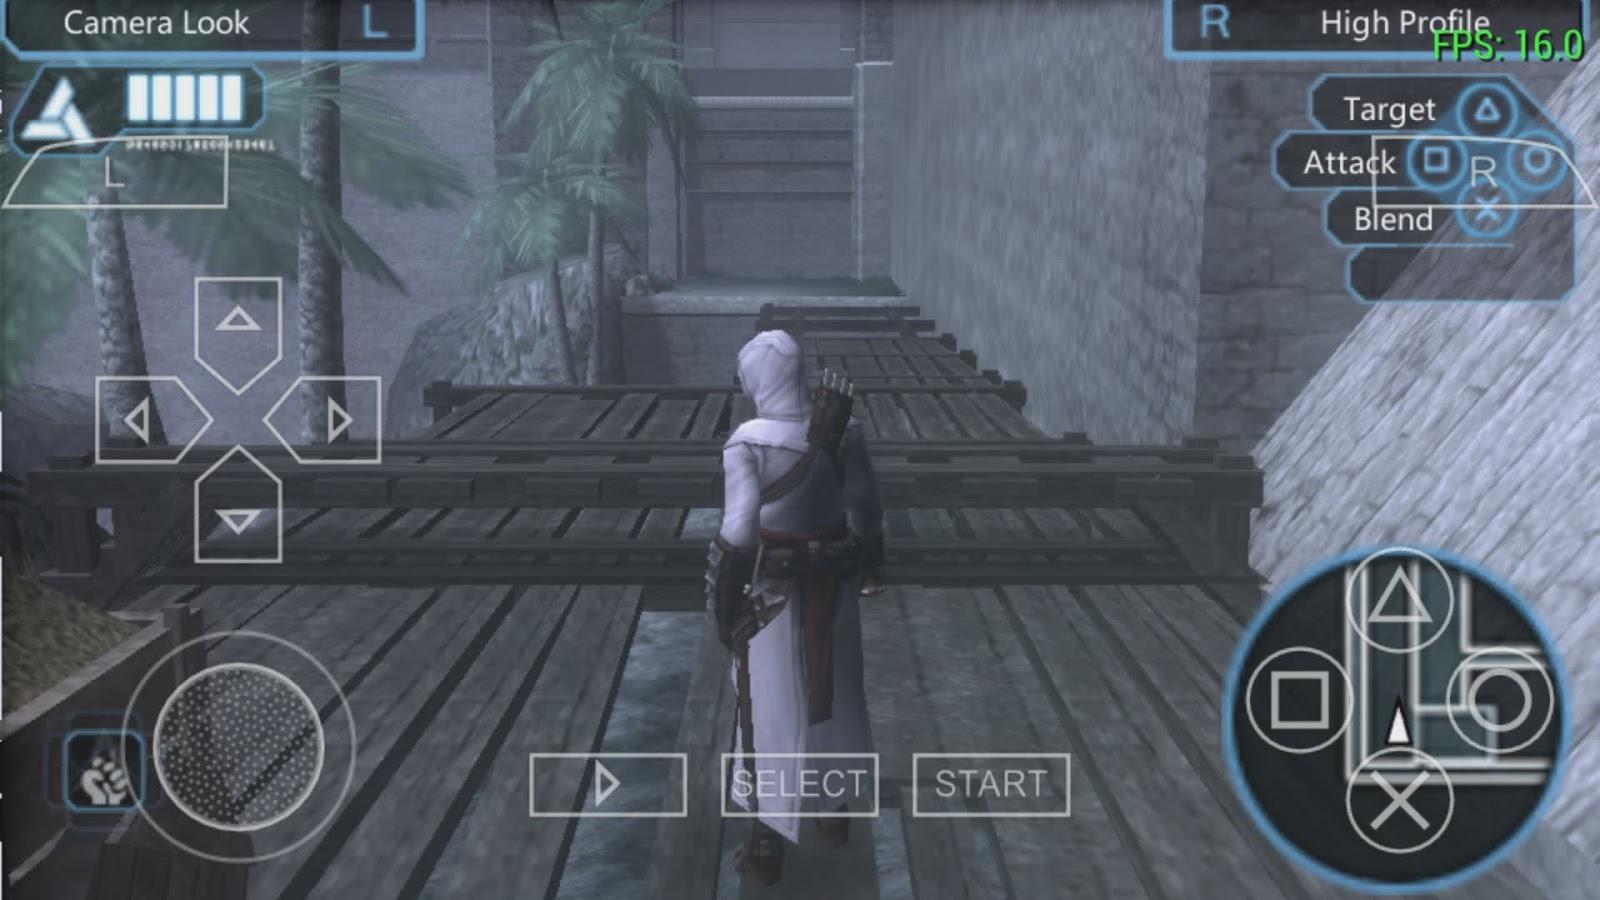 10 Best Ever PSP Games For PPSSPP Emulator To Download On